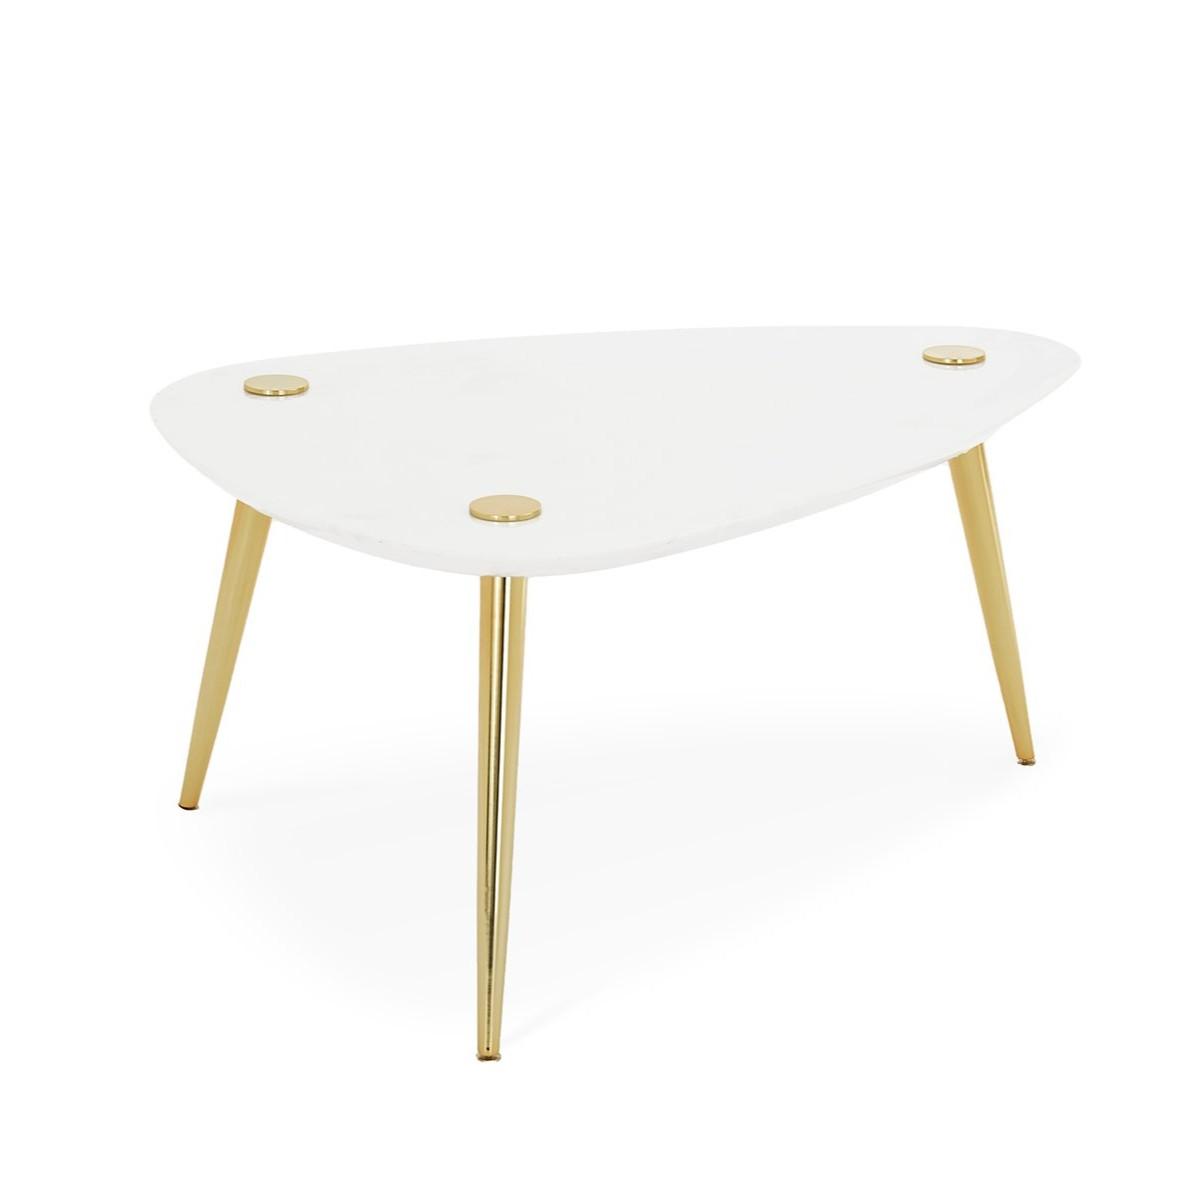 Jonathan Adler I Large Marble Triangle Table